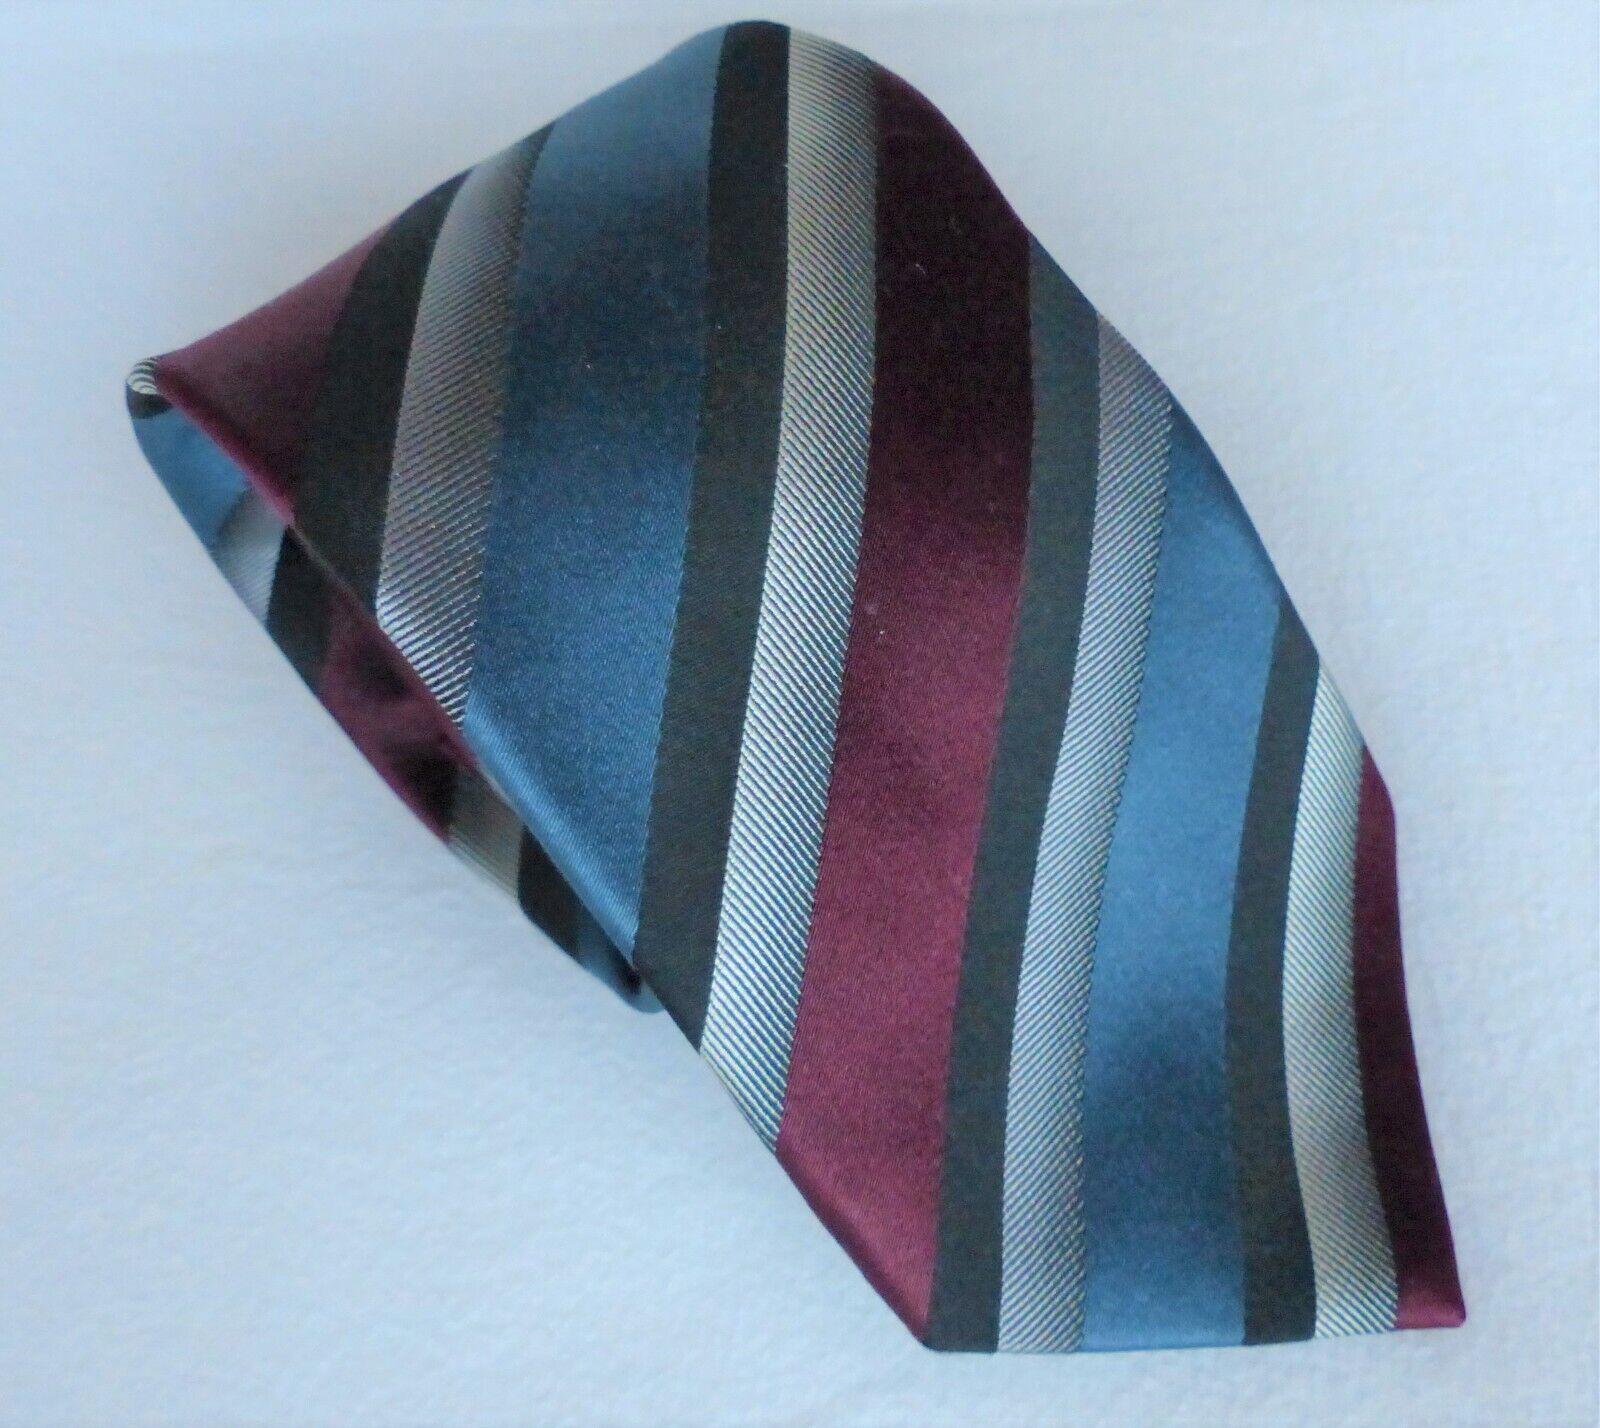 Eterna Excellent Blackline-Tie Blue Grey Bordeaux Striped - 100% Silk